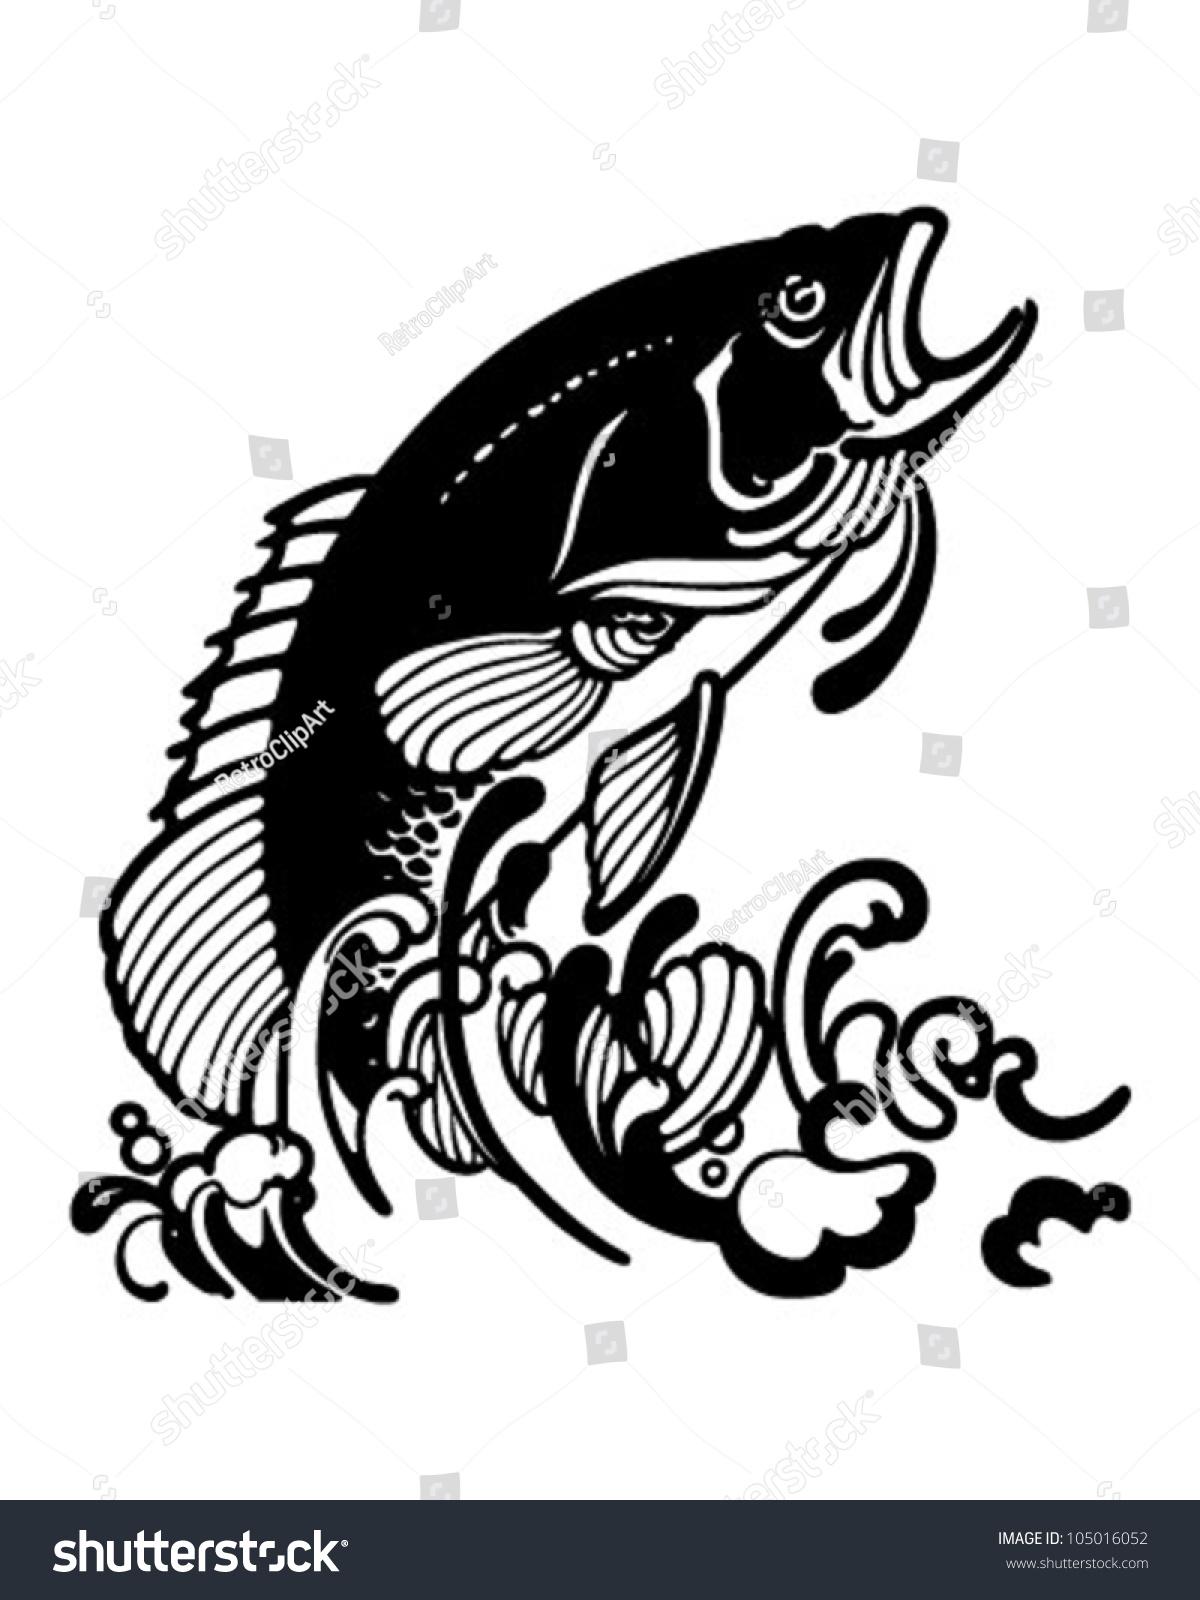 Stylized Jumping Fish Retro Clipart Illustration Stock Vector